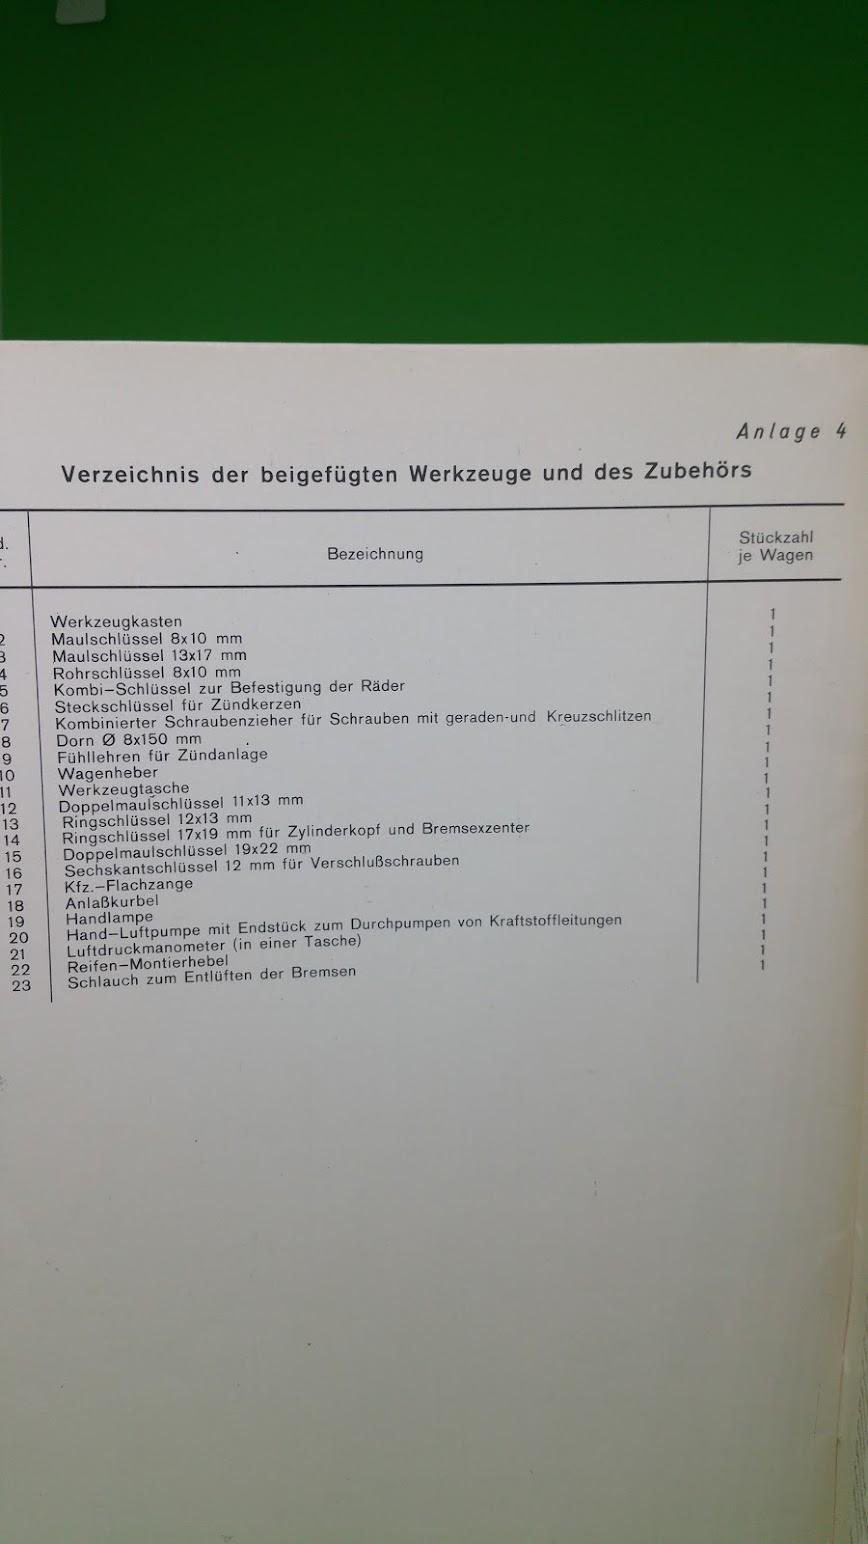 Betriebsanleitung - BA3 - WAS 21011 21013 - Lada - Shiguli